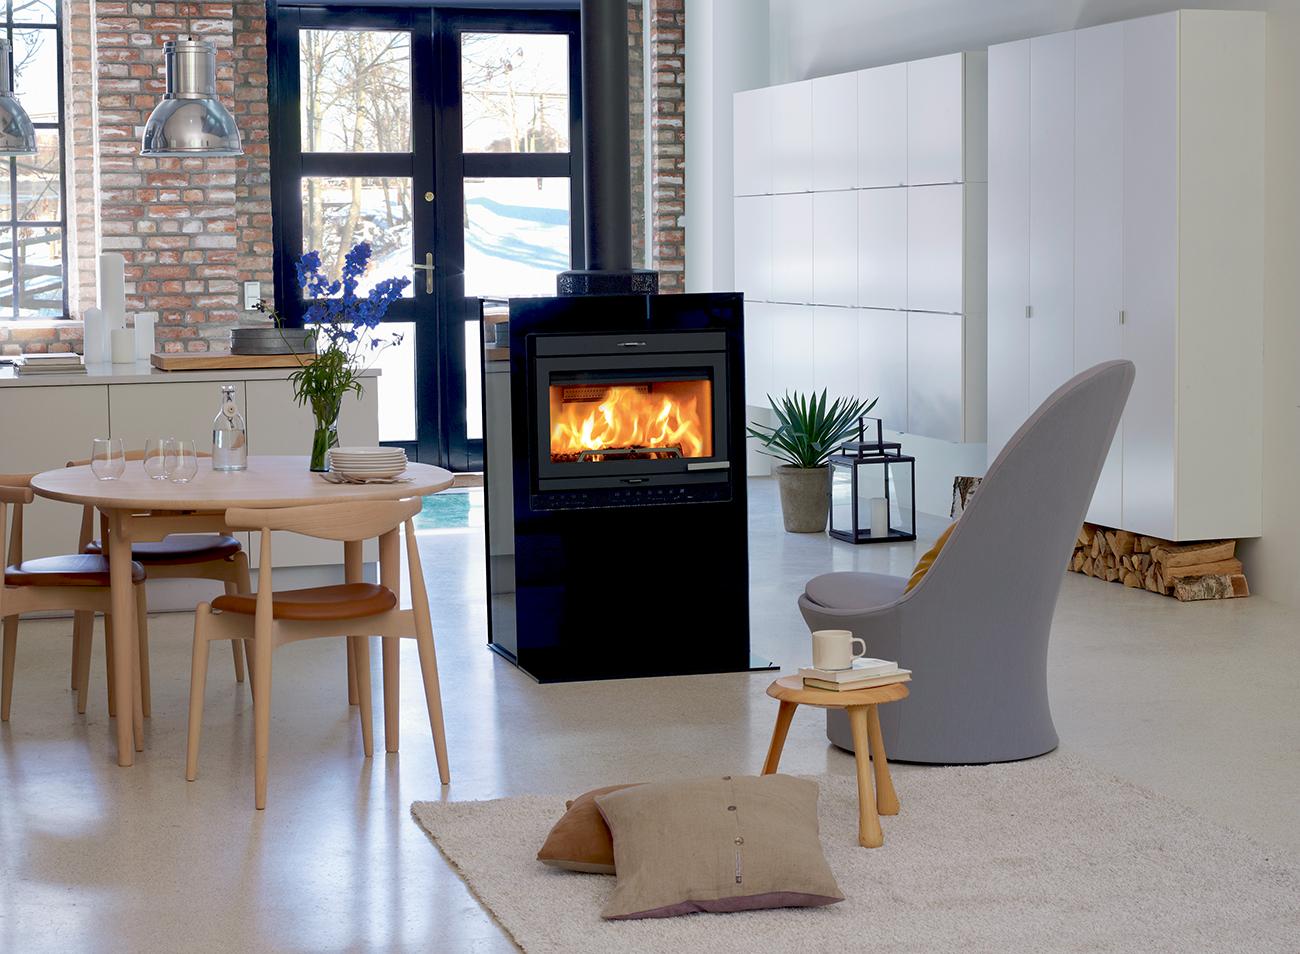 po le jotul i 400 habillage fa ade verre cot s en verre. Black Bedroom Furniture Sets. Home Design Ideas